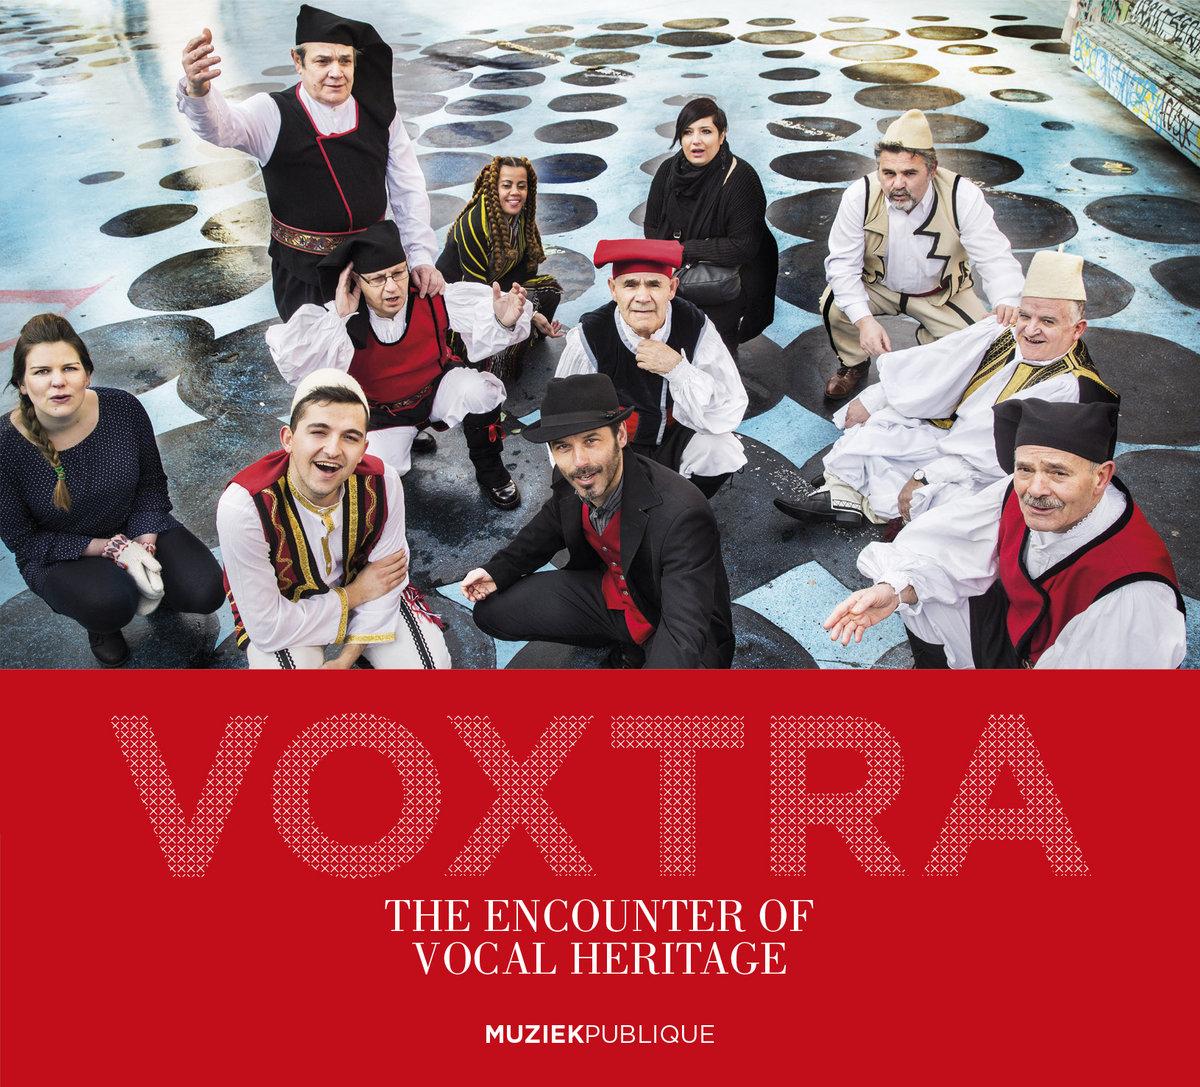 Voxtra